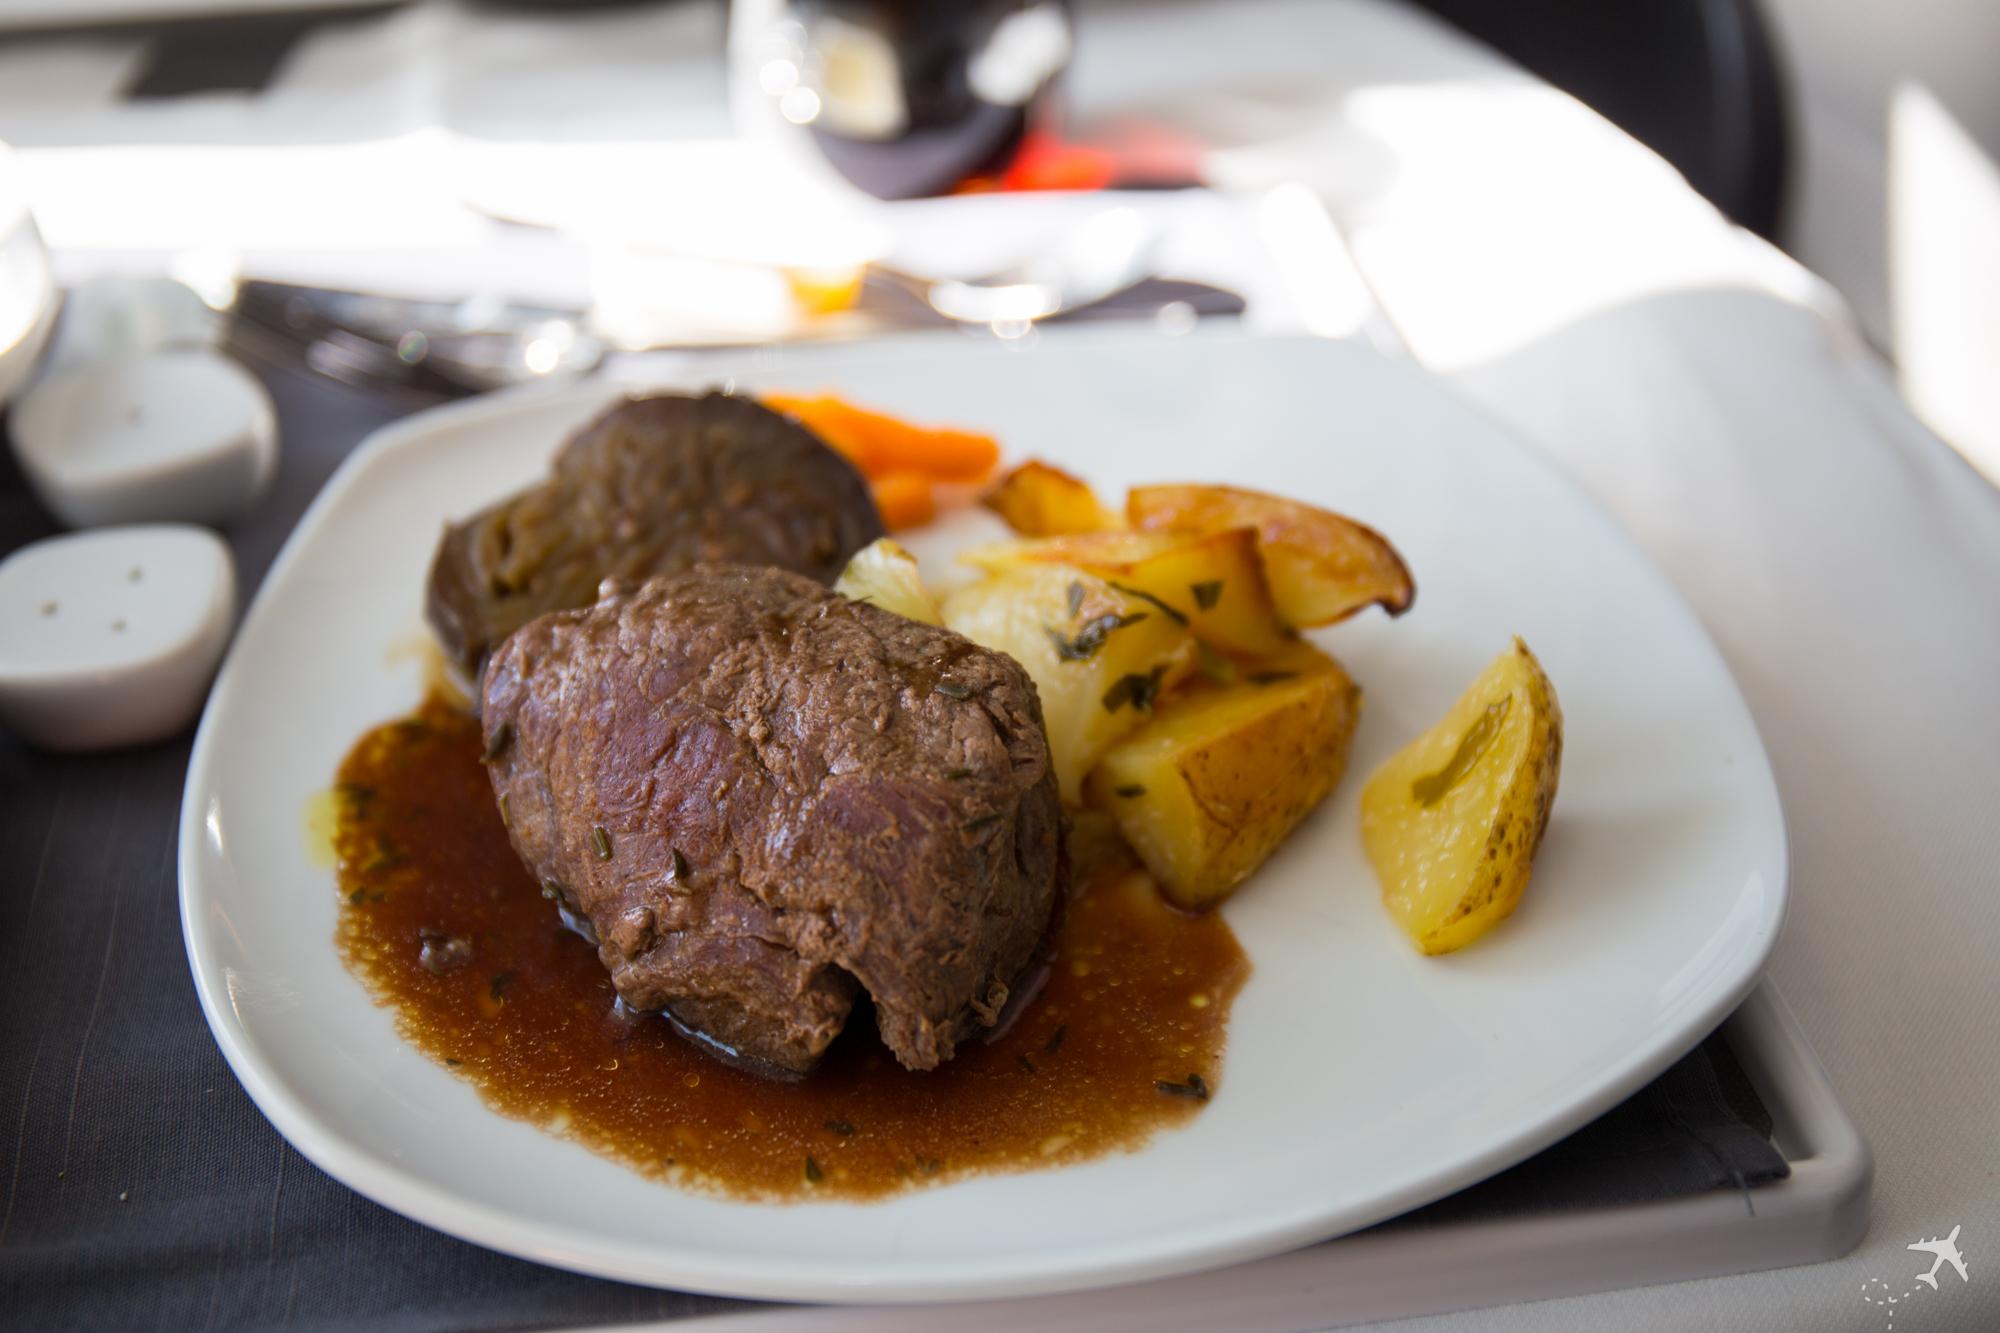 Air Canada Boeing 787-9 Business Class Lunch Filetsteak